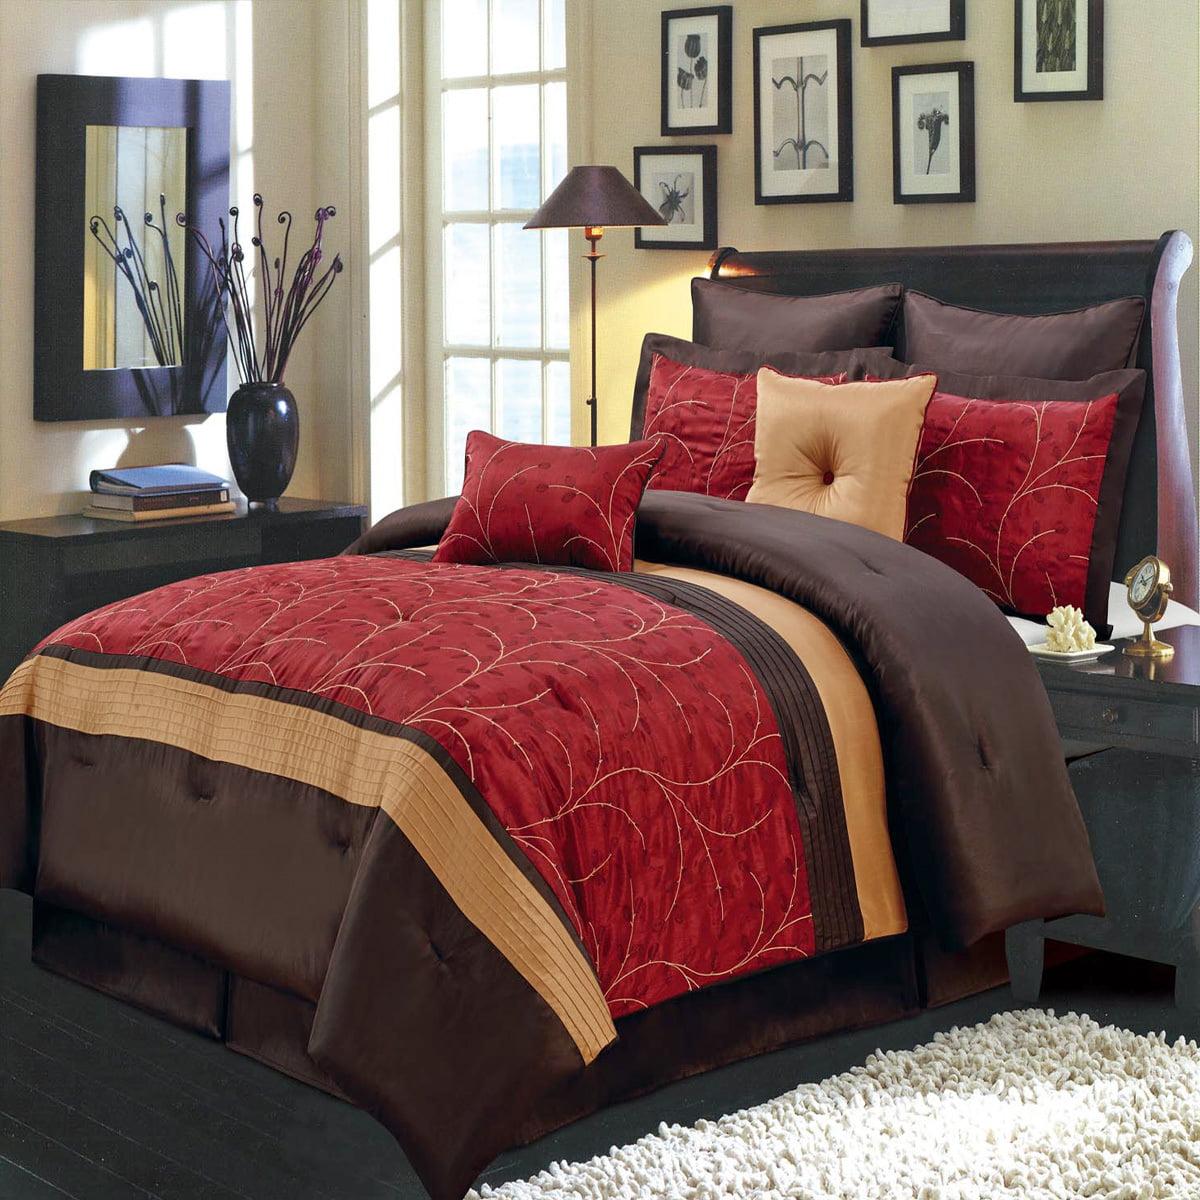 Atlantis Bed in a Bag 12-PC Bedding Set, Includes Comfort...